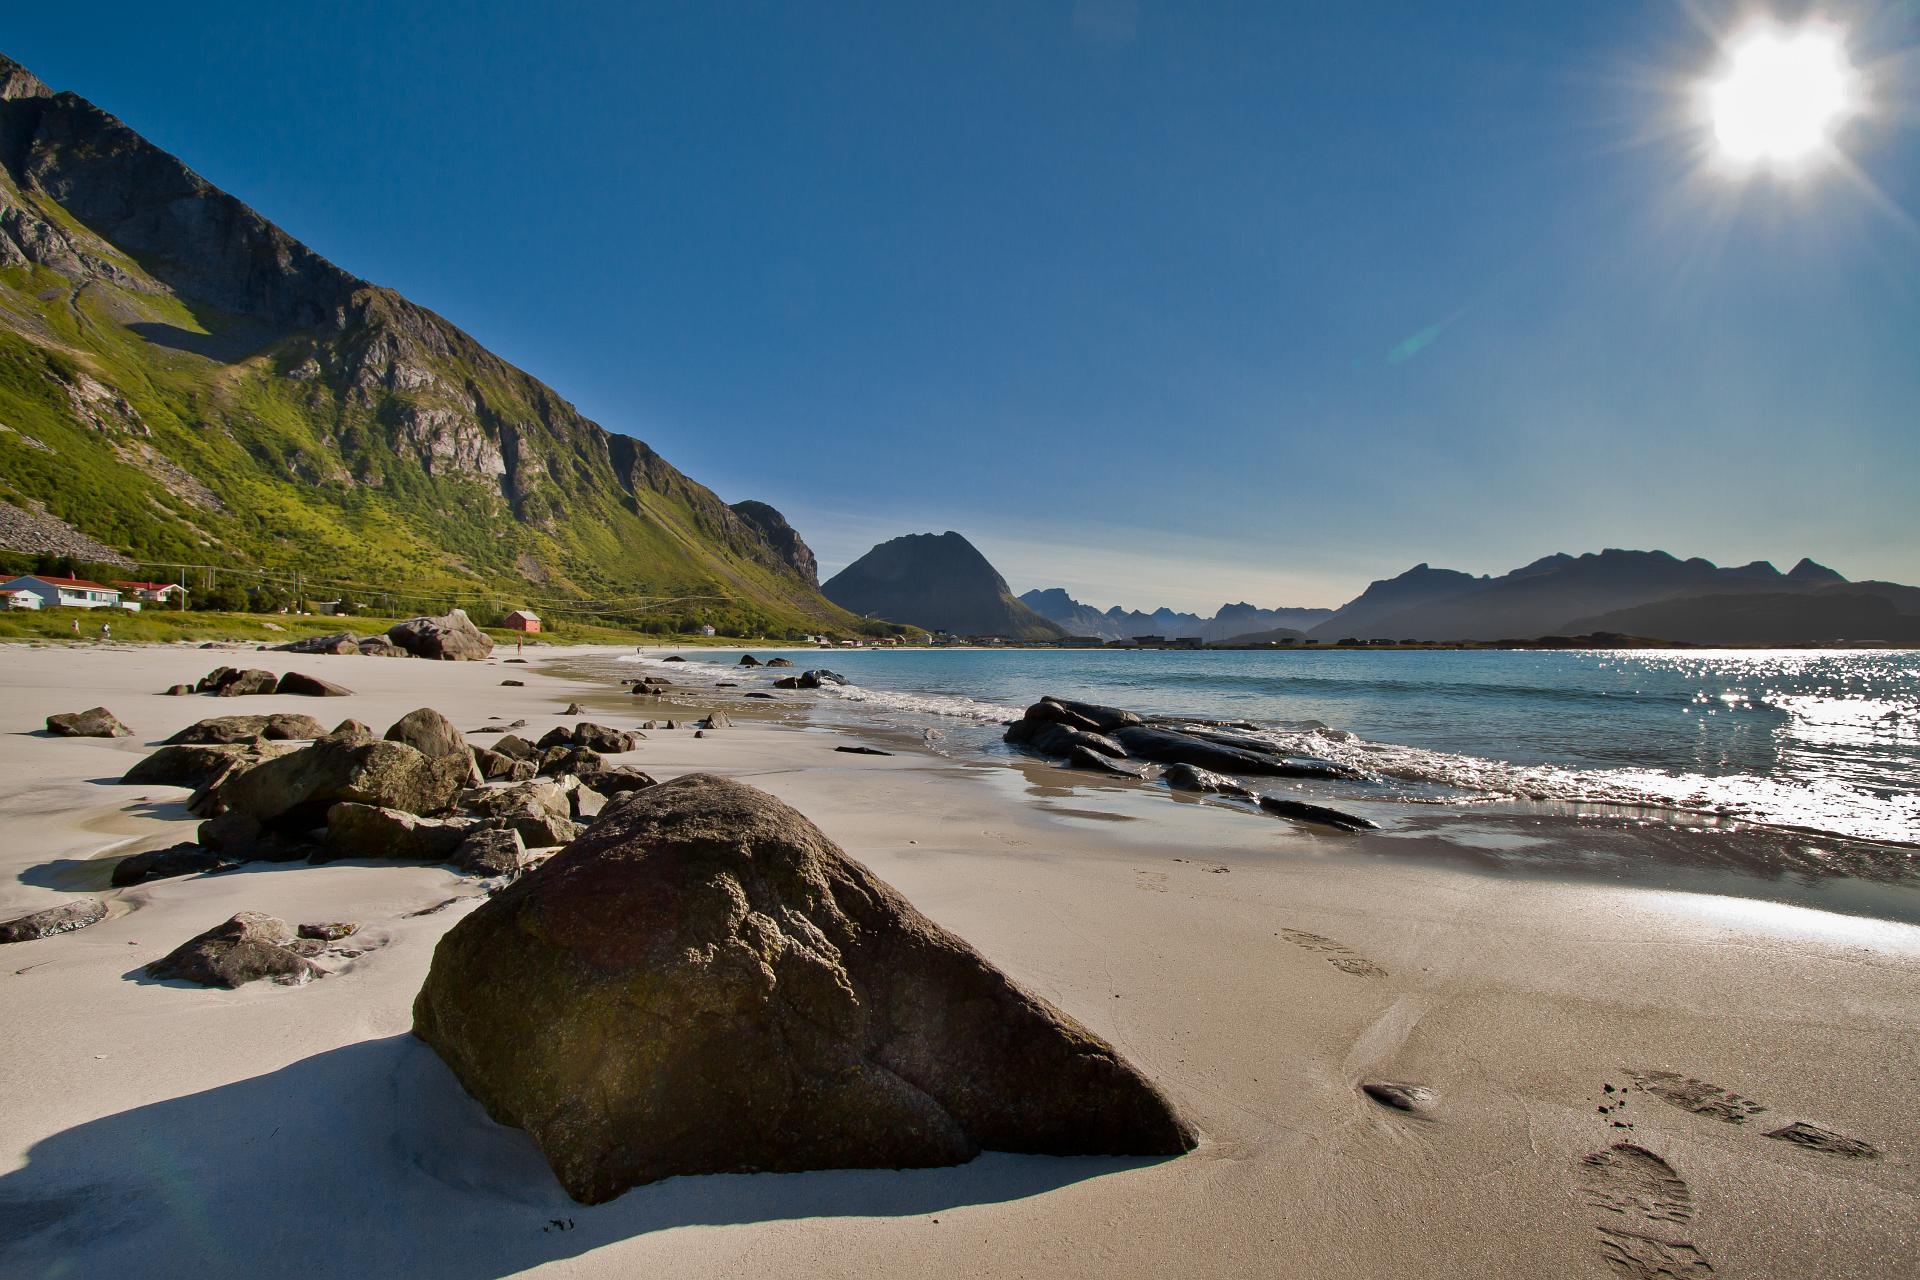 Otocje Lofoten, Norveska (Lofoten Islands, Norway)